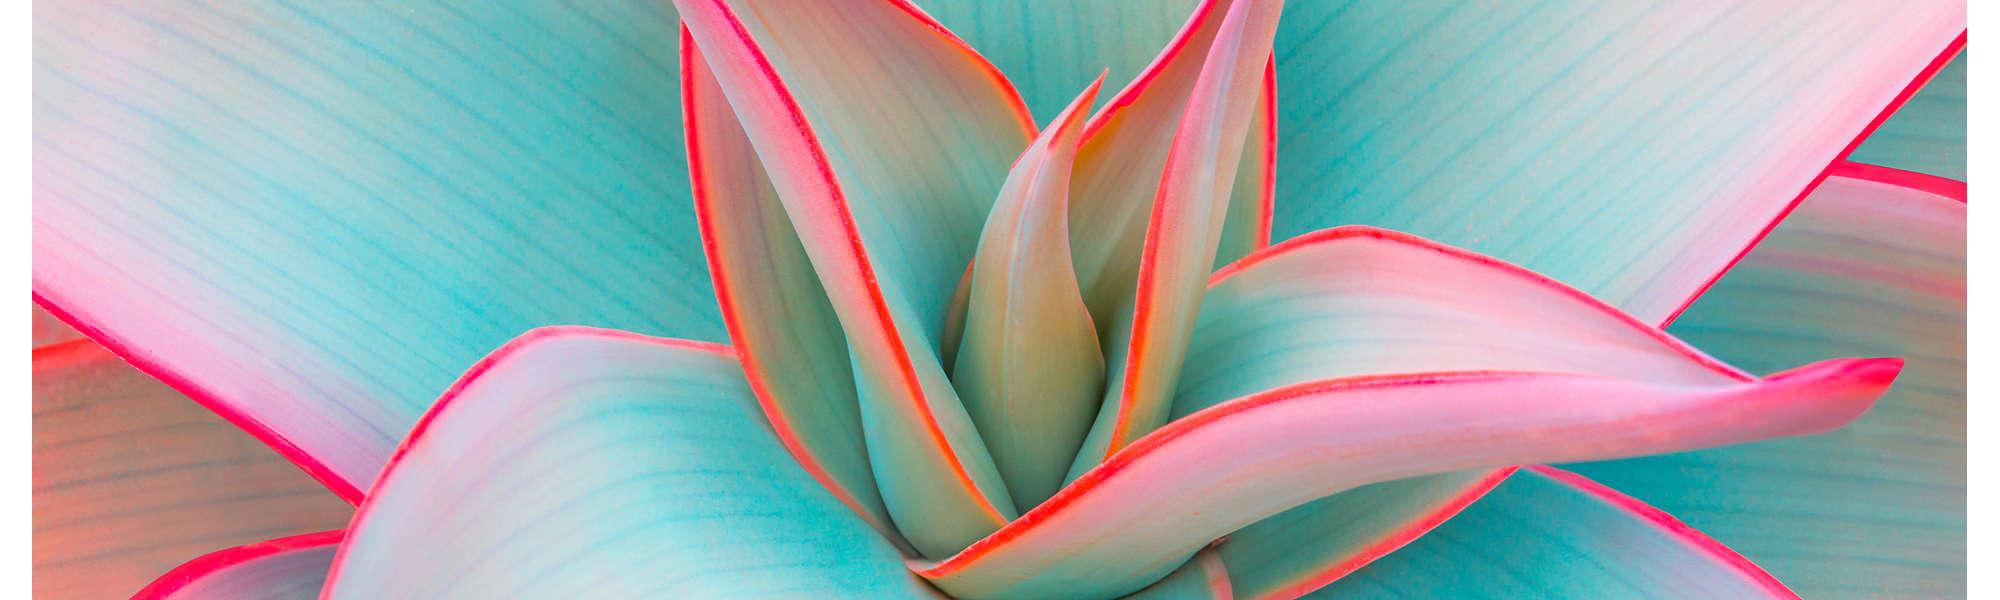 Agave leaves pastel